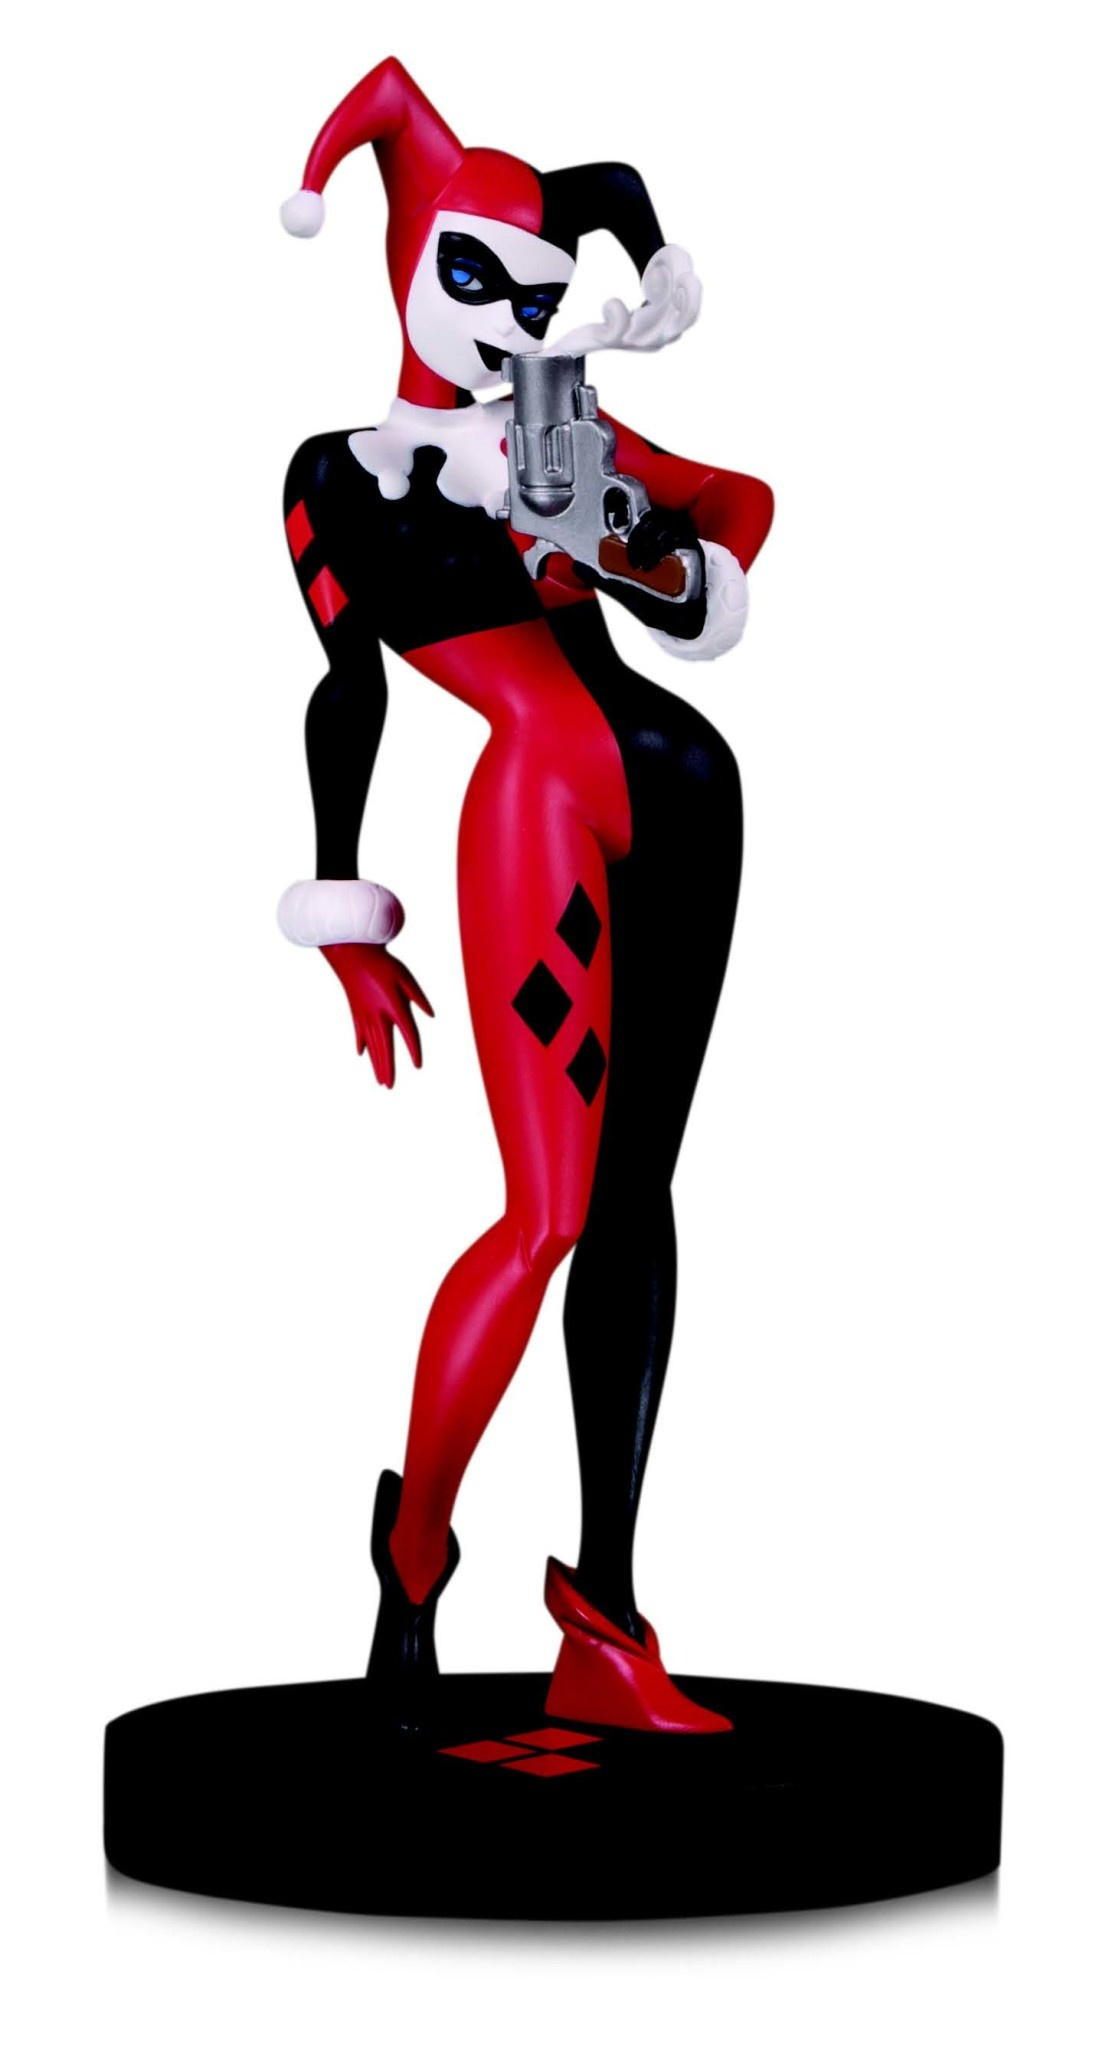 Diamond Direct DC Comics: Designer Series - Harley Quinn Mini Statue by Bruce Timm